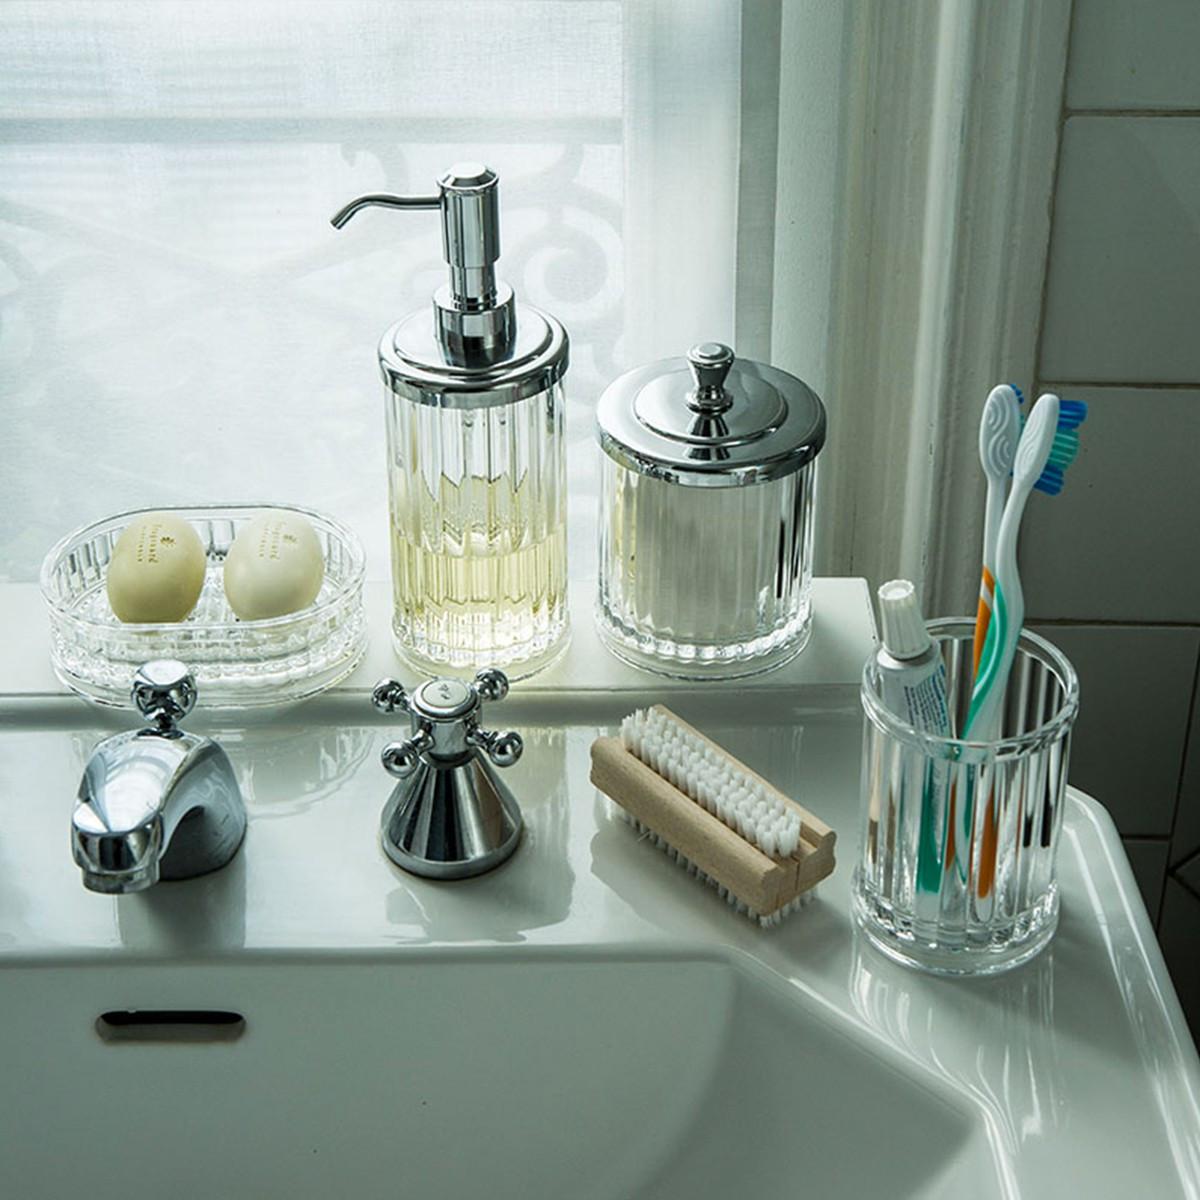 Distributeur savon rangement salle de bain for Distributeur salle de bain